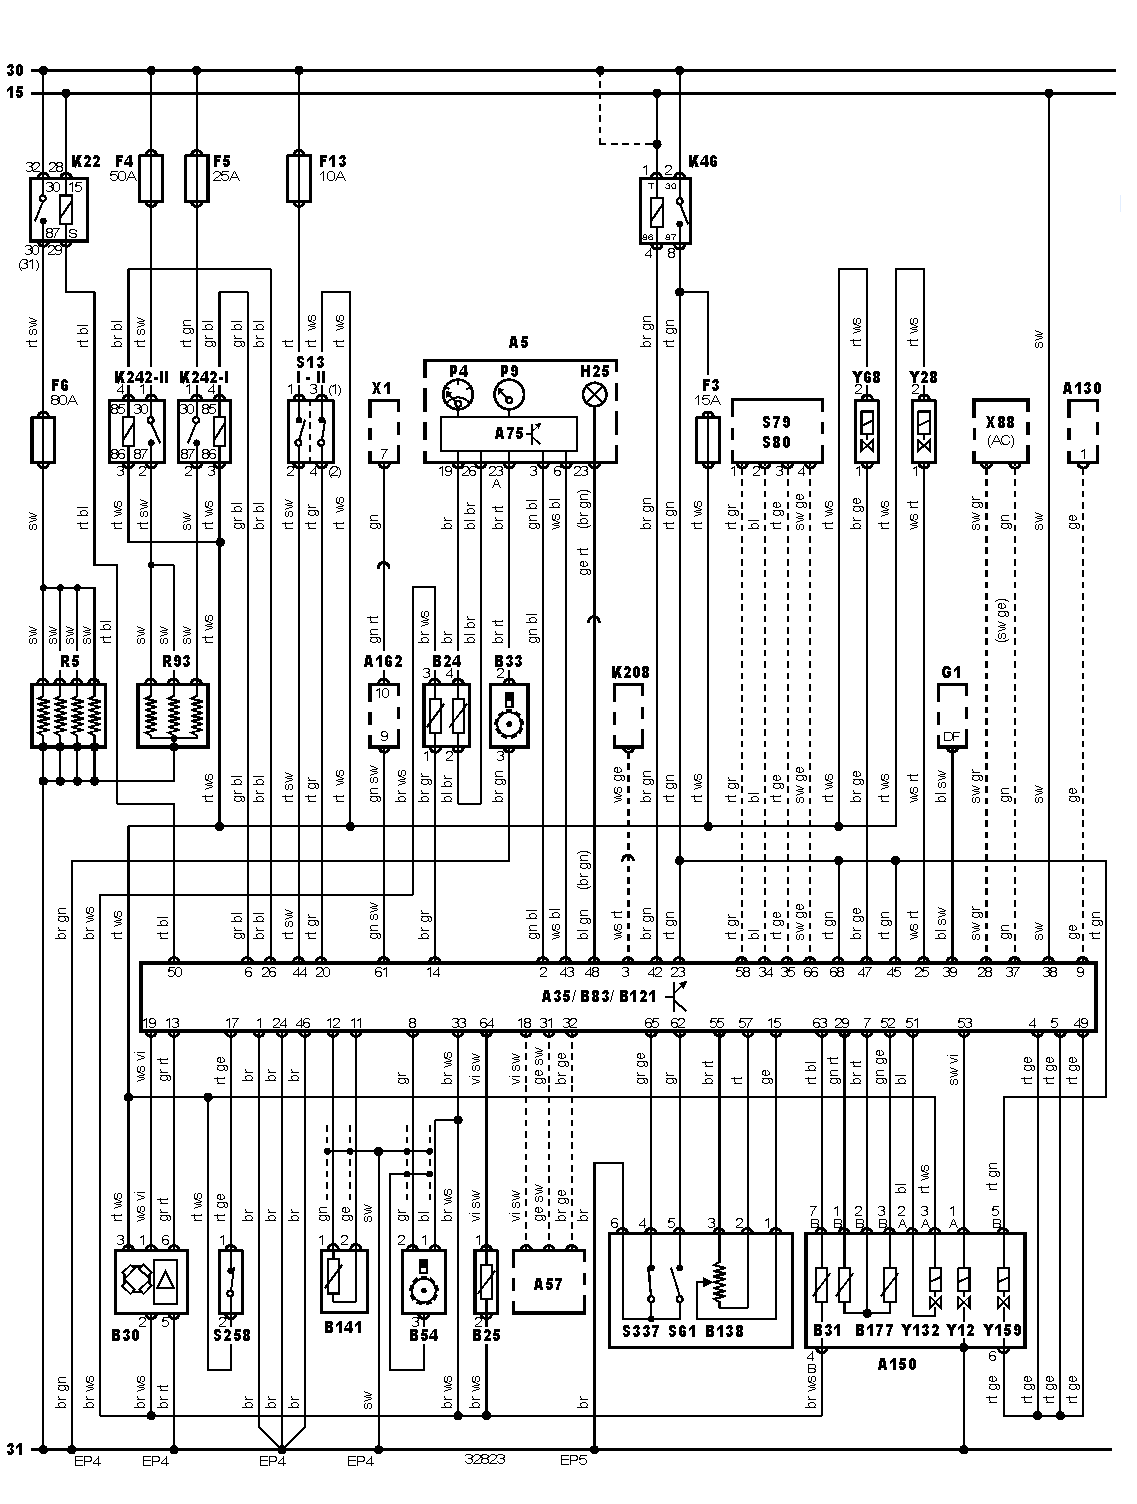 Audi Tt Mk2 Wiring Diagram - 2004 330i Engine Diagram M  oneheart.au-delice-limousin.fr | Audi Tt Mk2 Wiring Diagram |  | Bege Place Wiring Diagram - Bege Wiring Diagram Full Edition